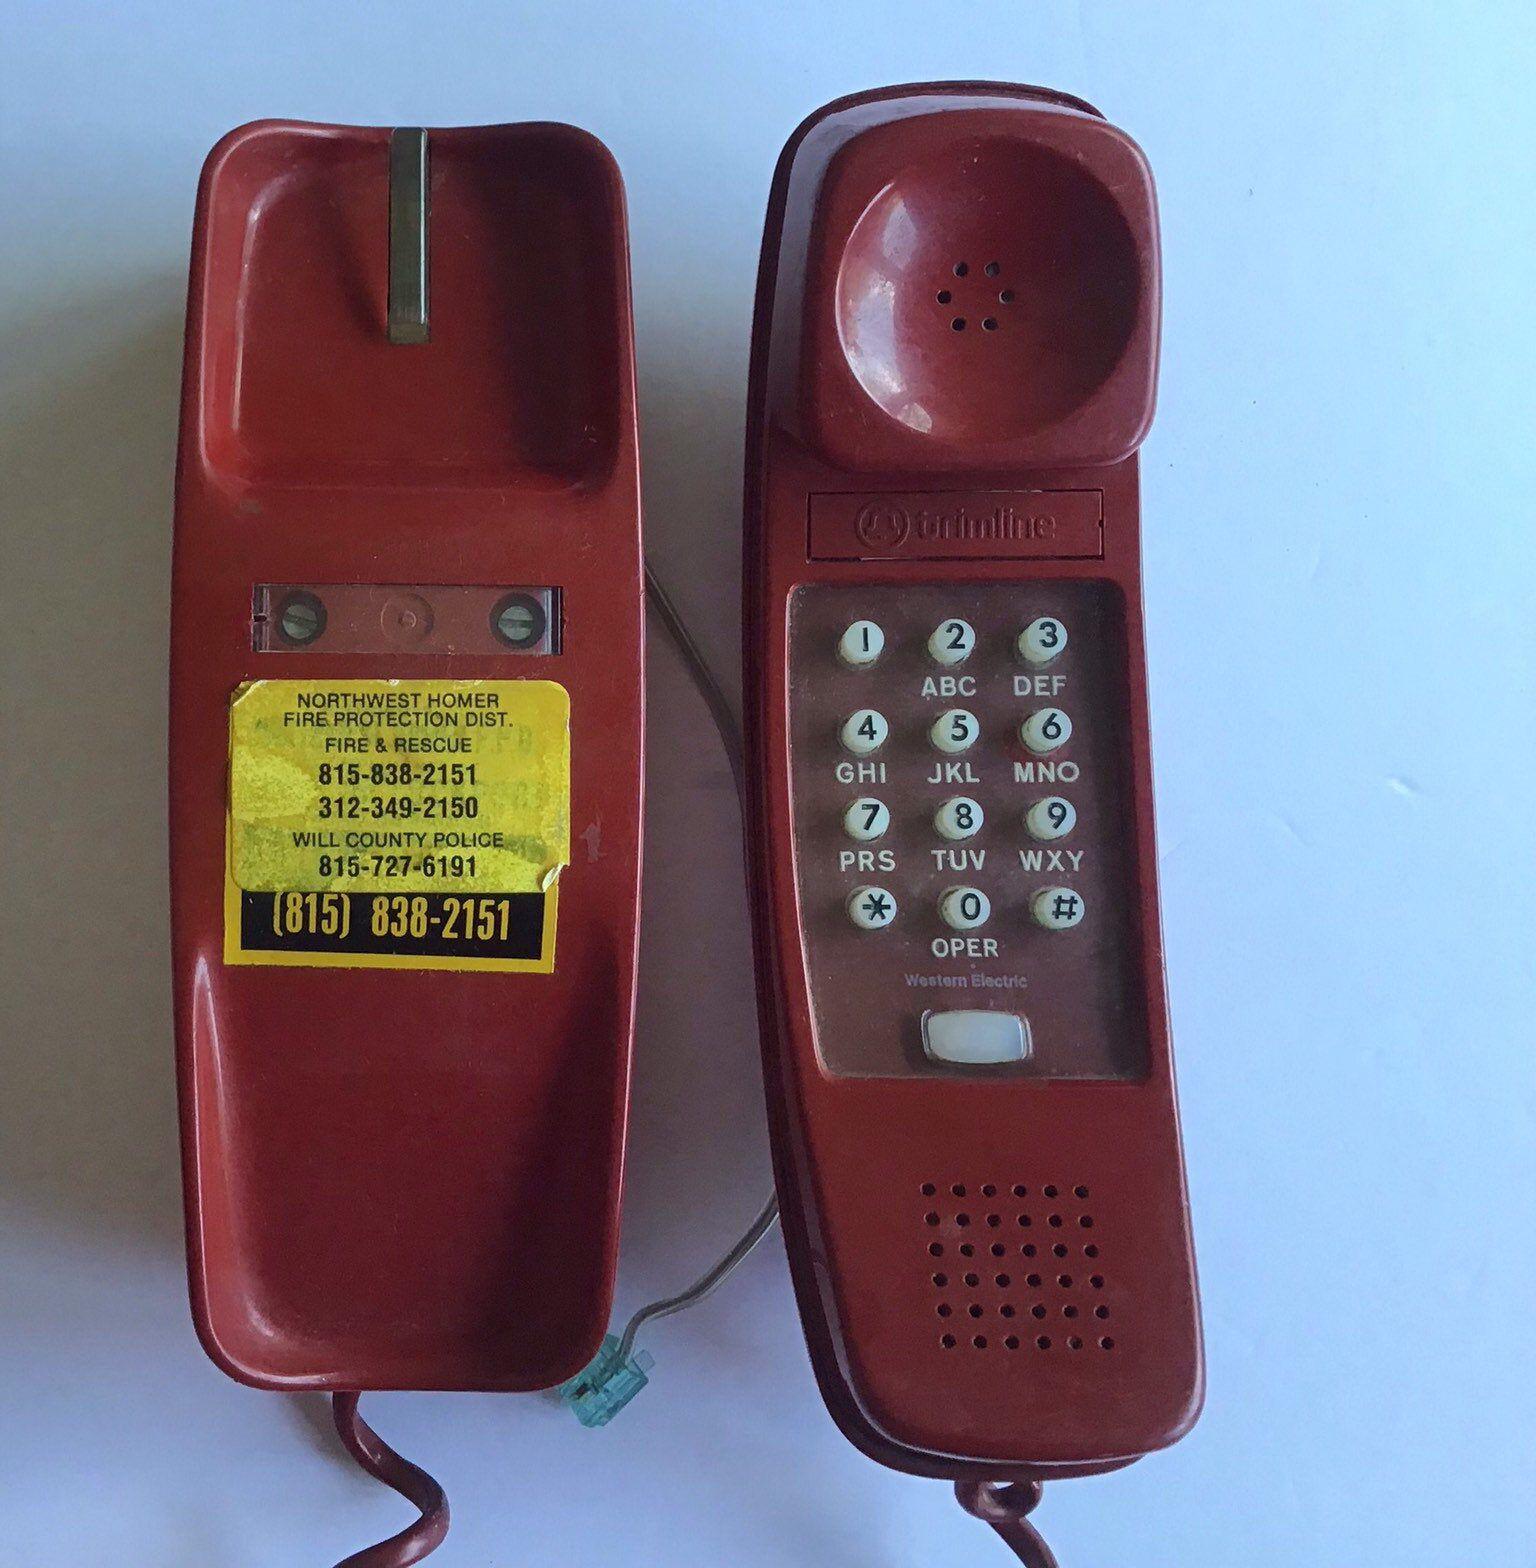 Vintage Red Trimline Telephone Western Rlectric 1974 Retro Decor Telephone Retro Decor Etsy Etsy Shop Owner